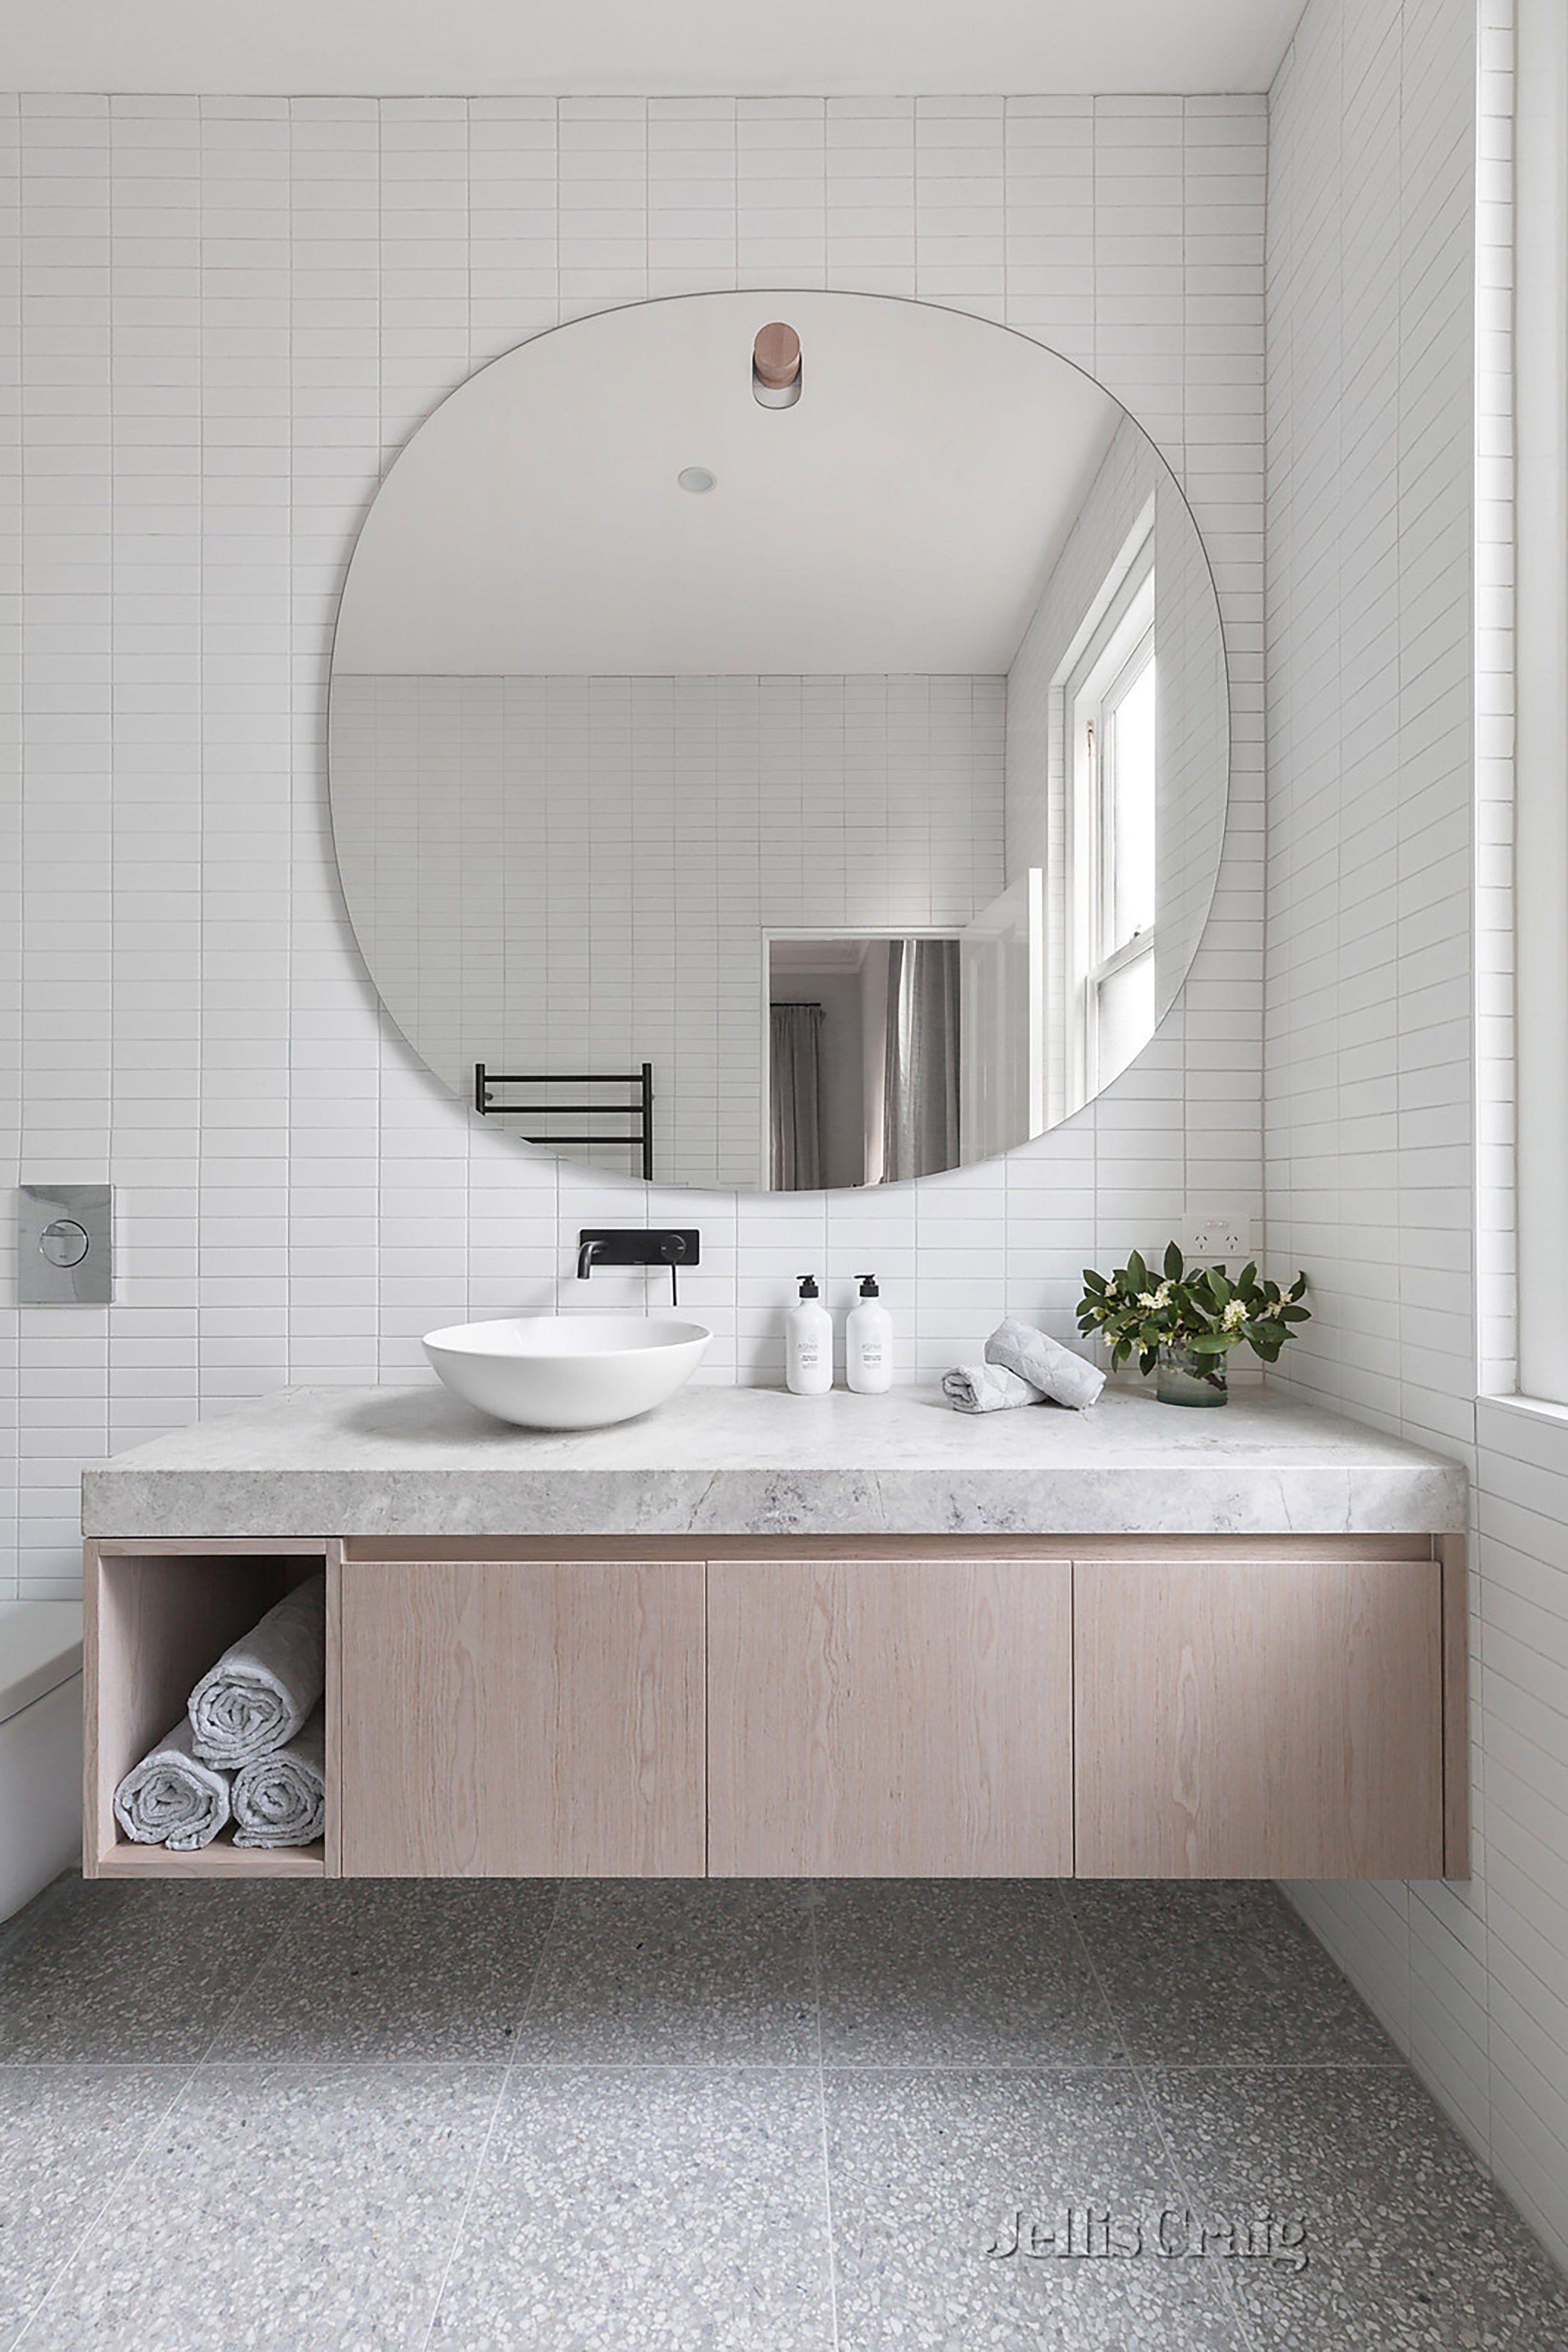 25+ Beautiful Bathroom Mirror Ideas For a Small Bathroom | Bathroom ...